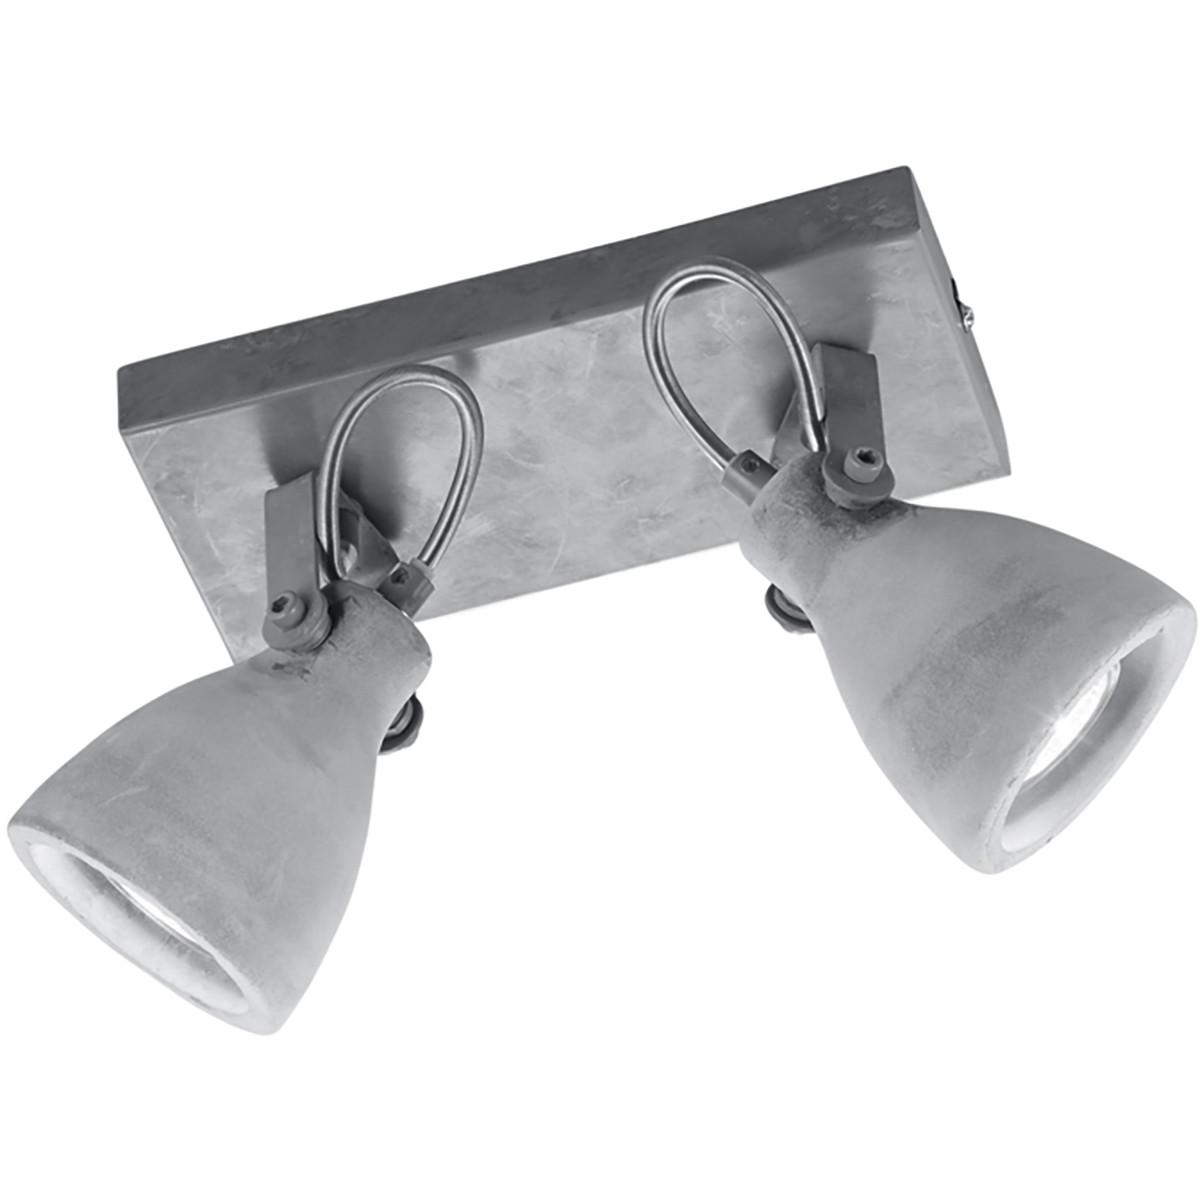 LED Plafondspot - Trion Conry - GU10 Fitting - 2-lichts - Rechthoek - Mat Grijs Beton Look - Alumini